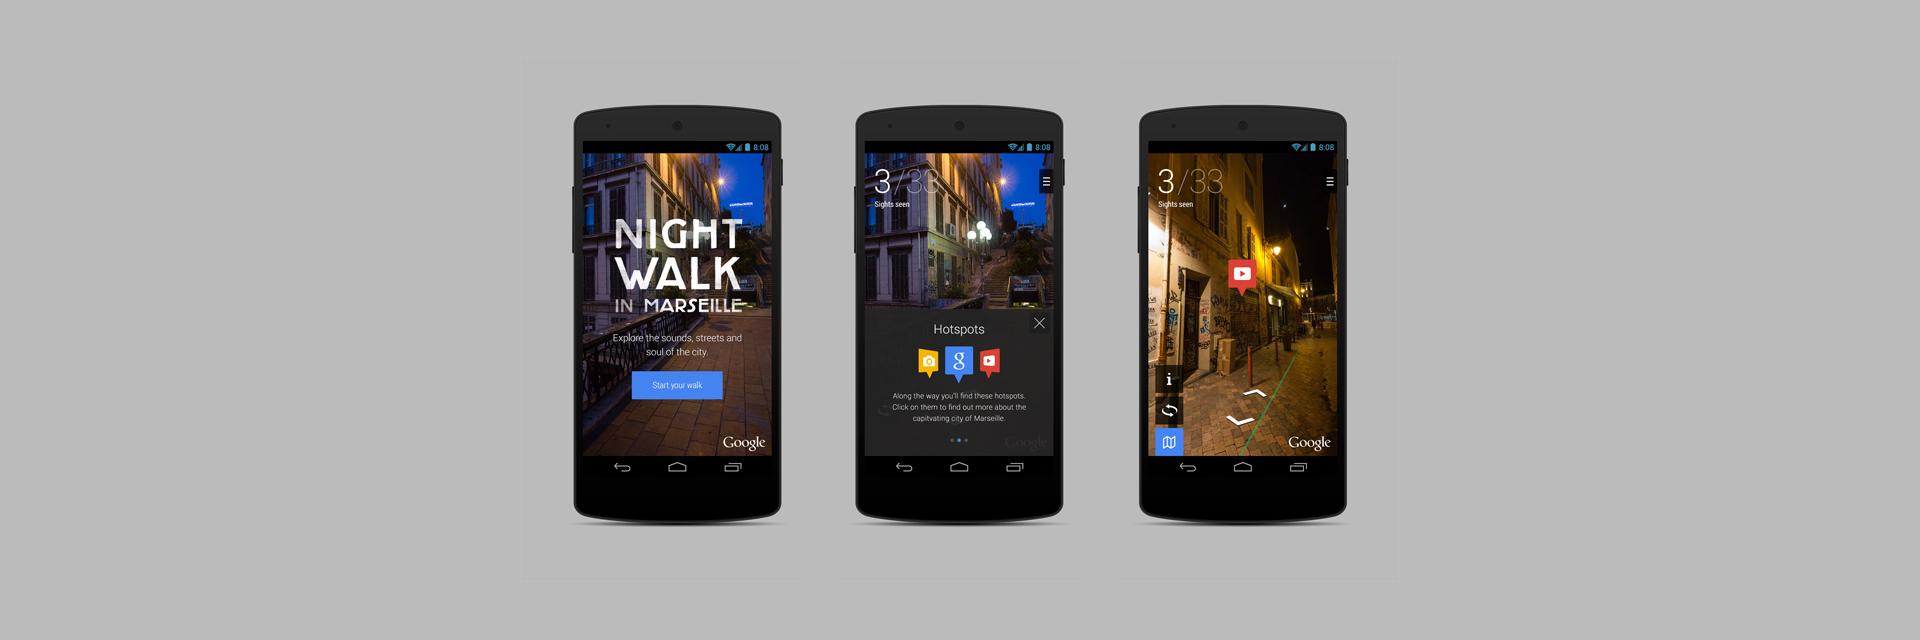 image_google_night_walk_7.jpg